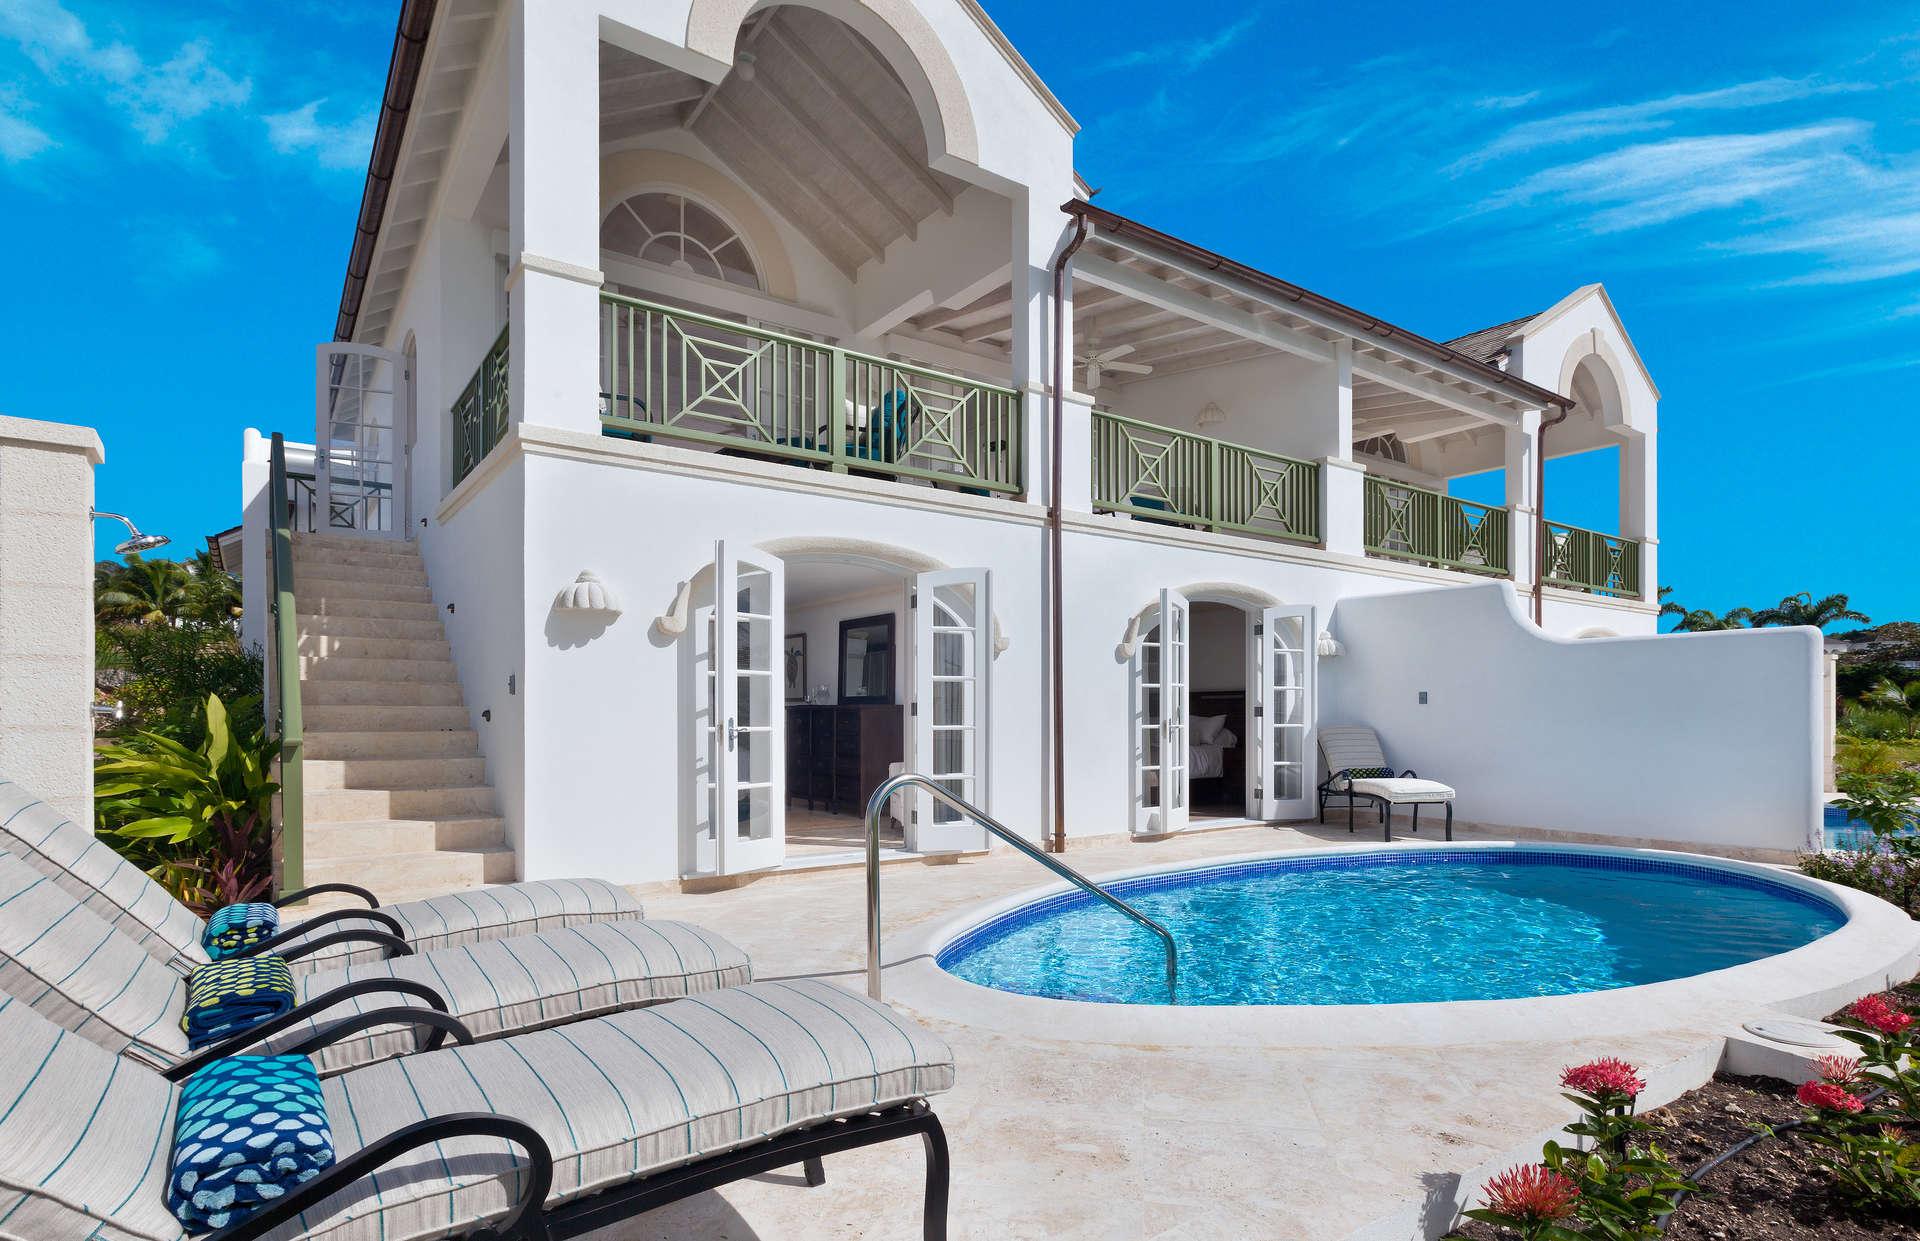 Luxury villa rentals caribbean - Barbados - St james - Royal westmoreland golf resort - Sugar Cane Ridge 12 - Image 1/10